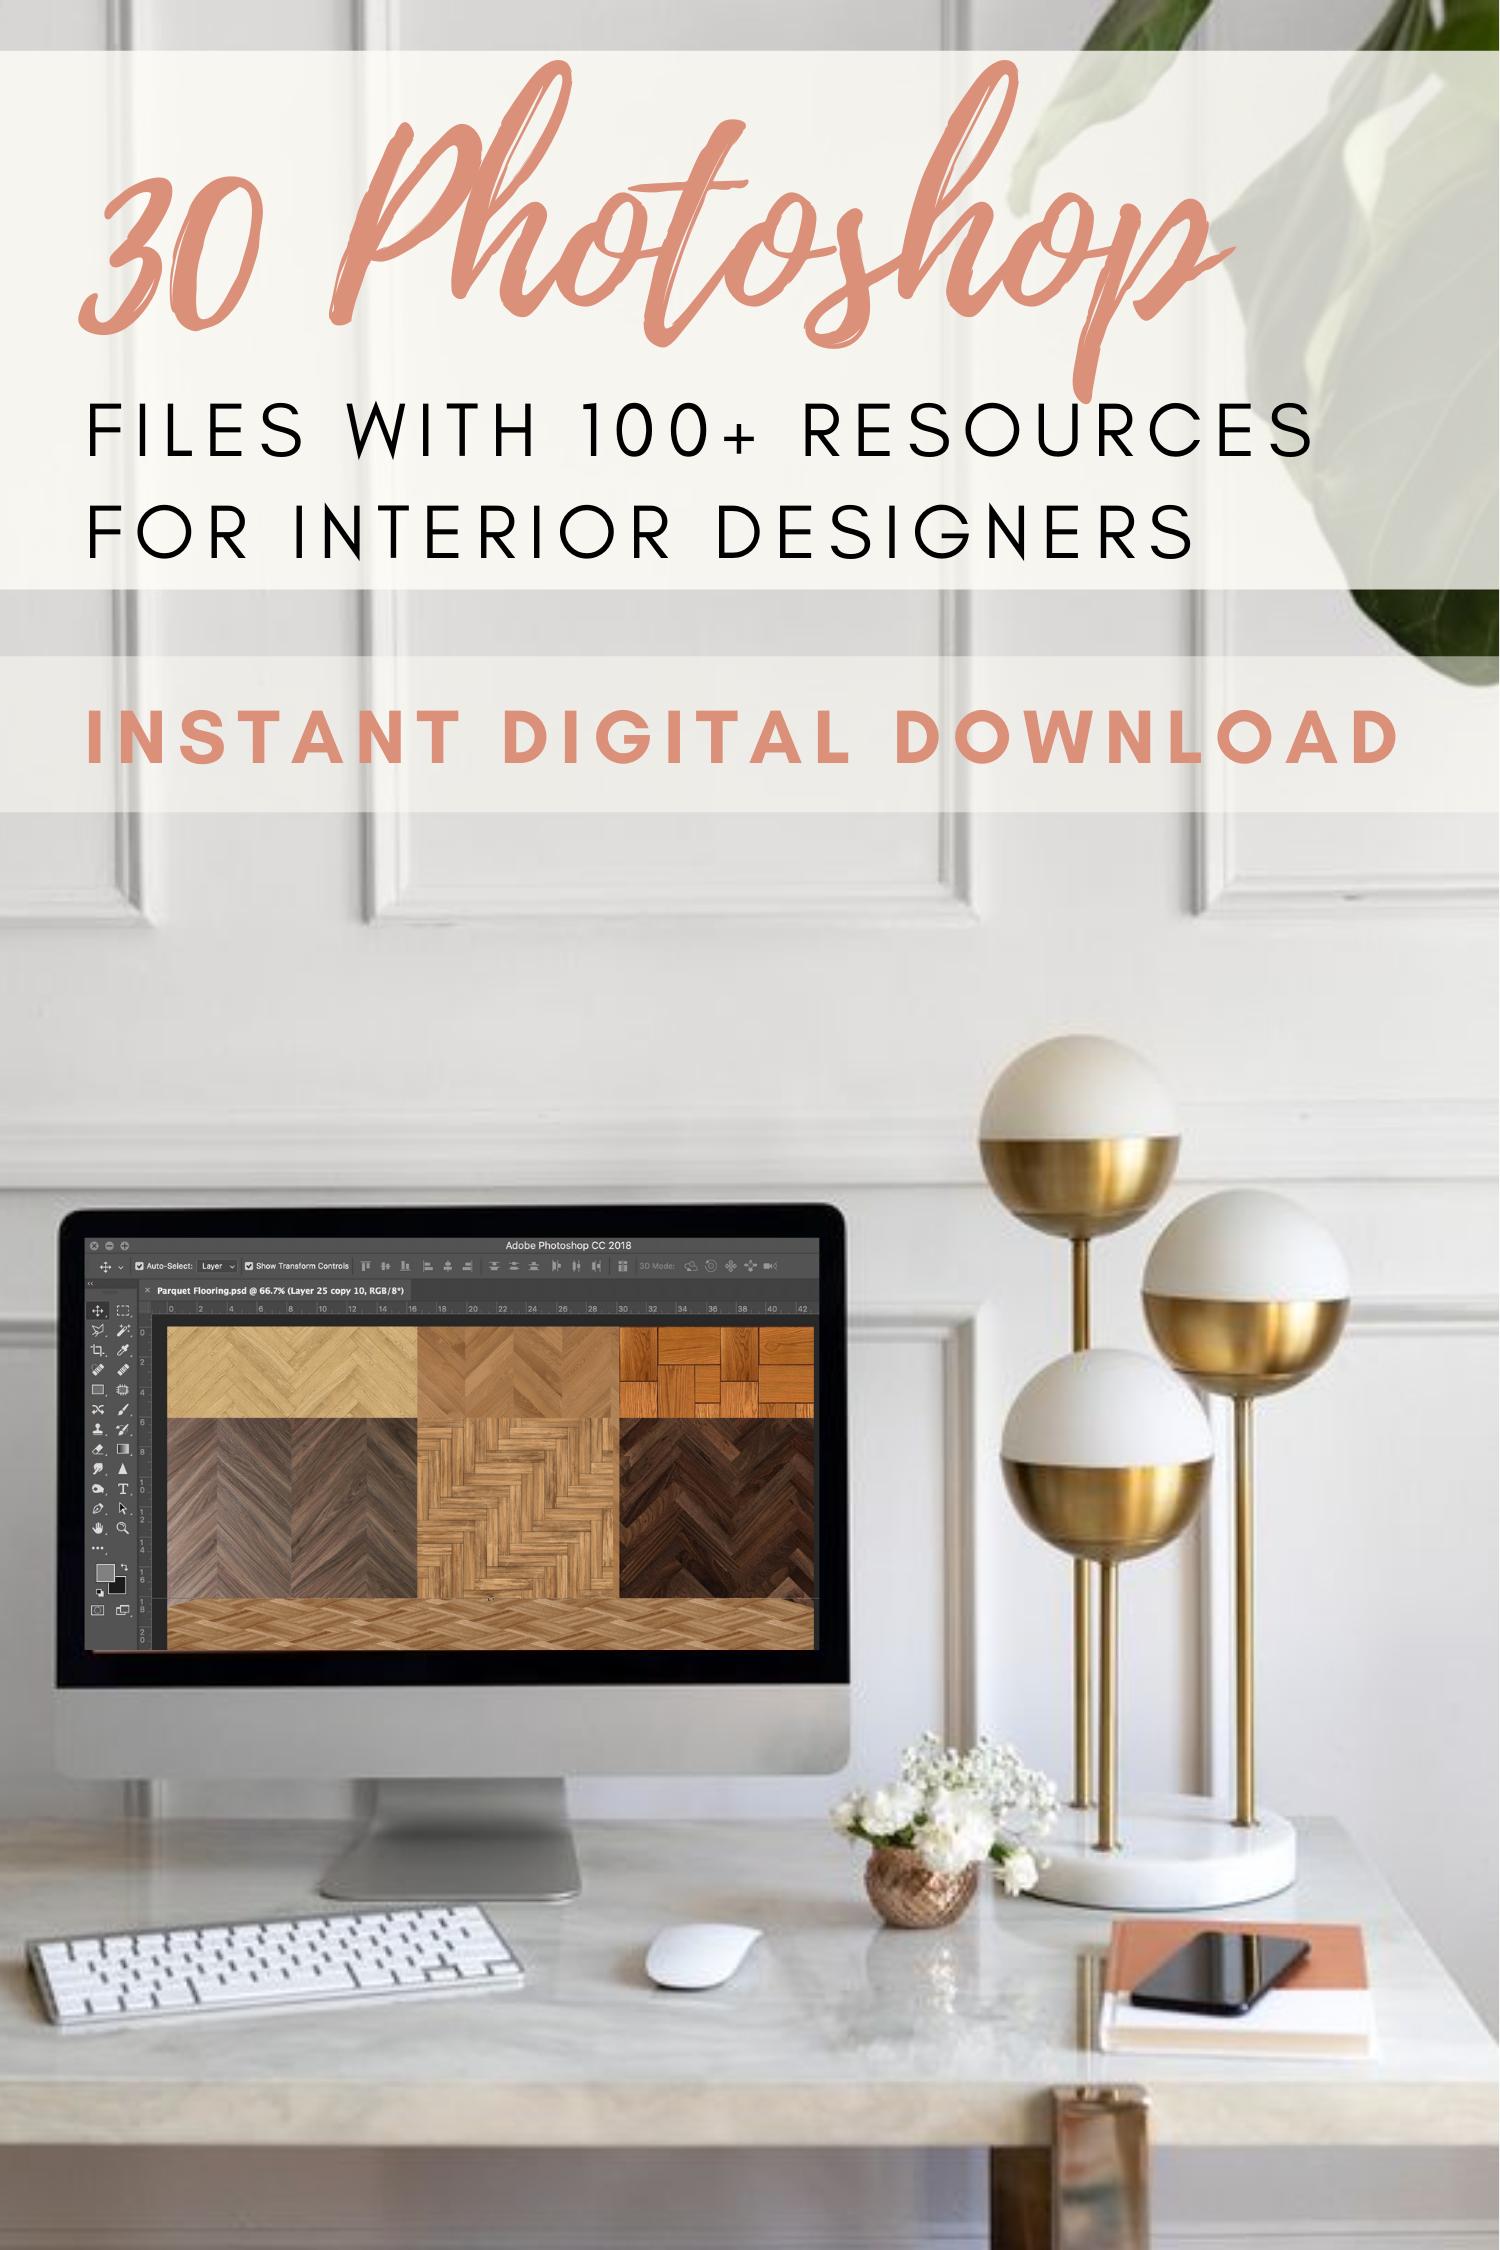 Digital Photoshop Resources For Interior Designers Photoshop Etsy Interior Design Student Interior Design Renderings Interior Design Resources